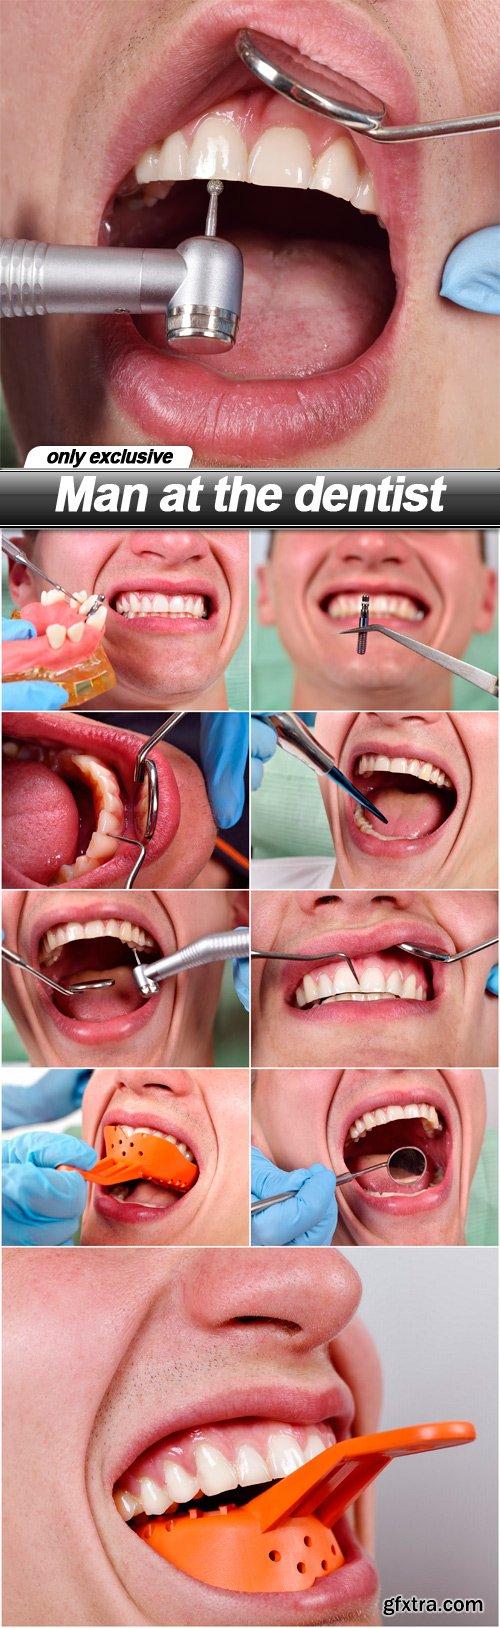 Man at the dentist - 10 UHQ JPEG